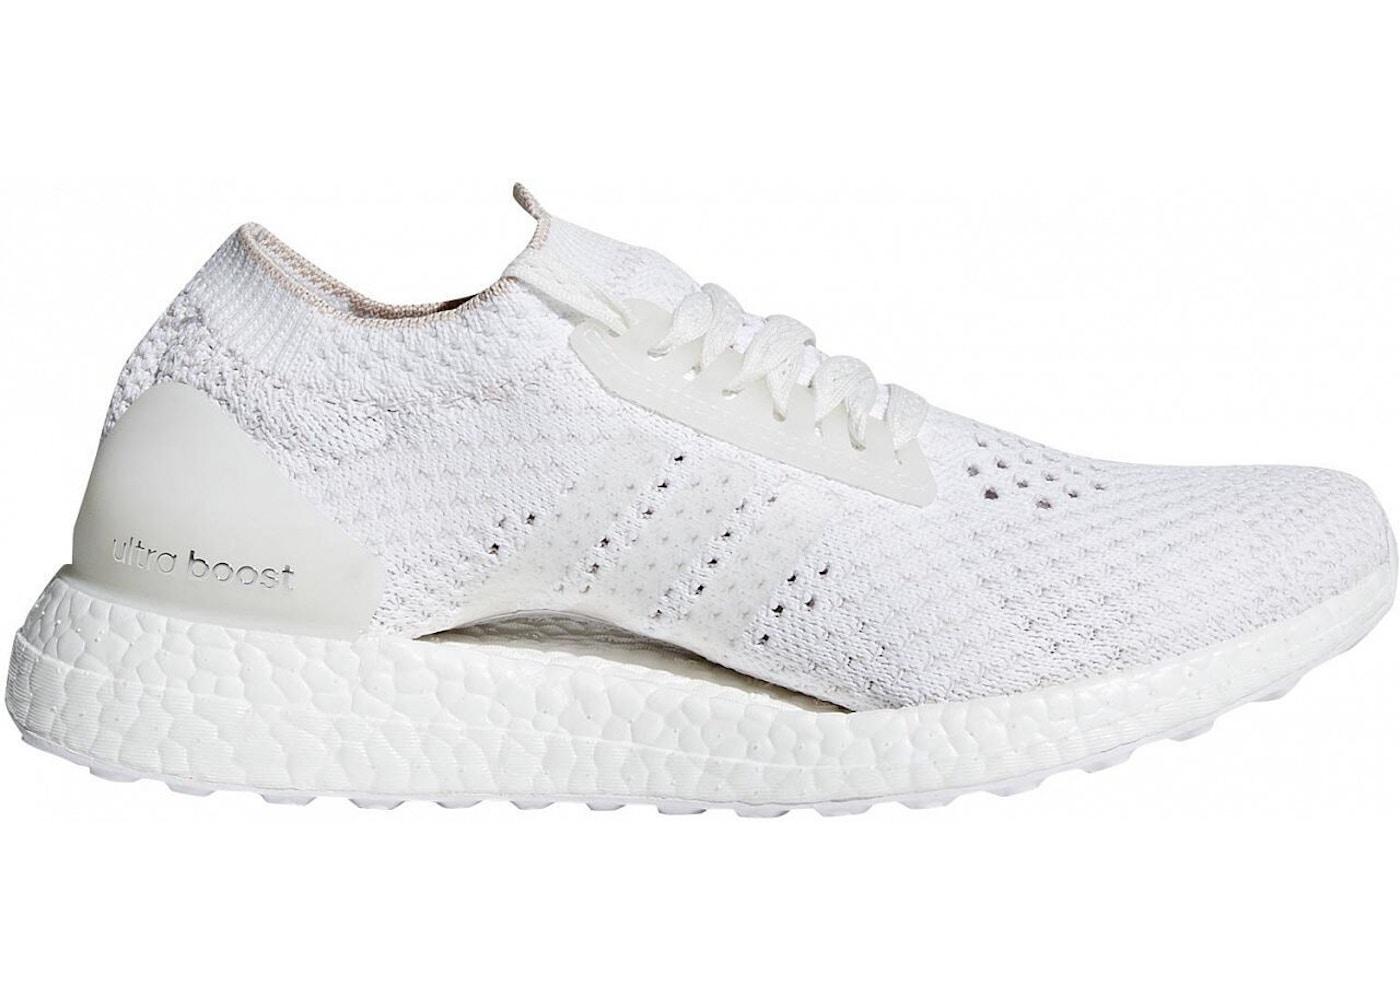 cheap for discount 0464c c0032 adidas Ultraboost X Clima Footwear White Ash Pearl (W)